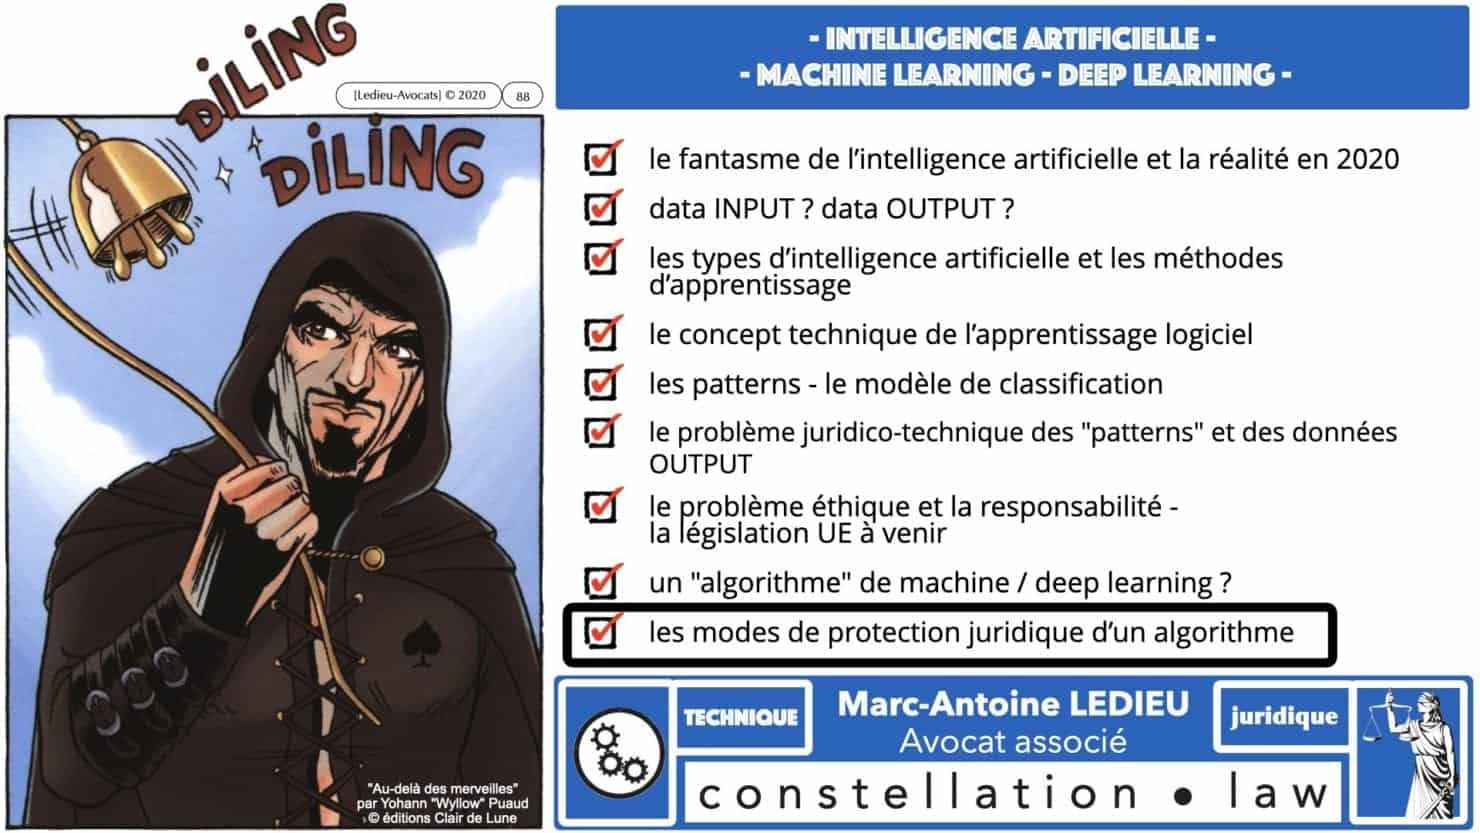 307 Intelligence artificielle-machine-learning-deep-learning-base de données-BIG-DATA *16:9* Constellation ©Ledieu-Avocat-13-10-2020.088